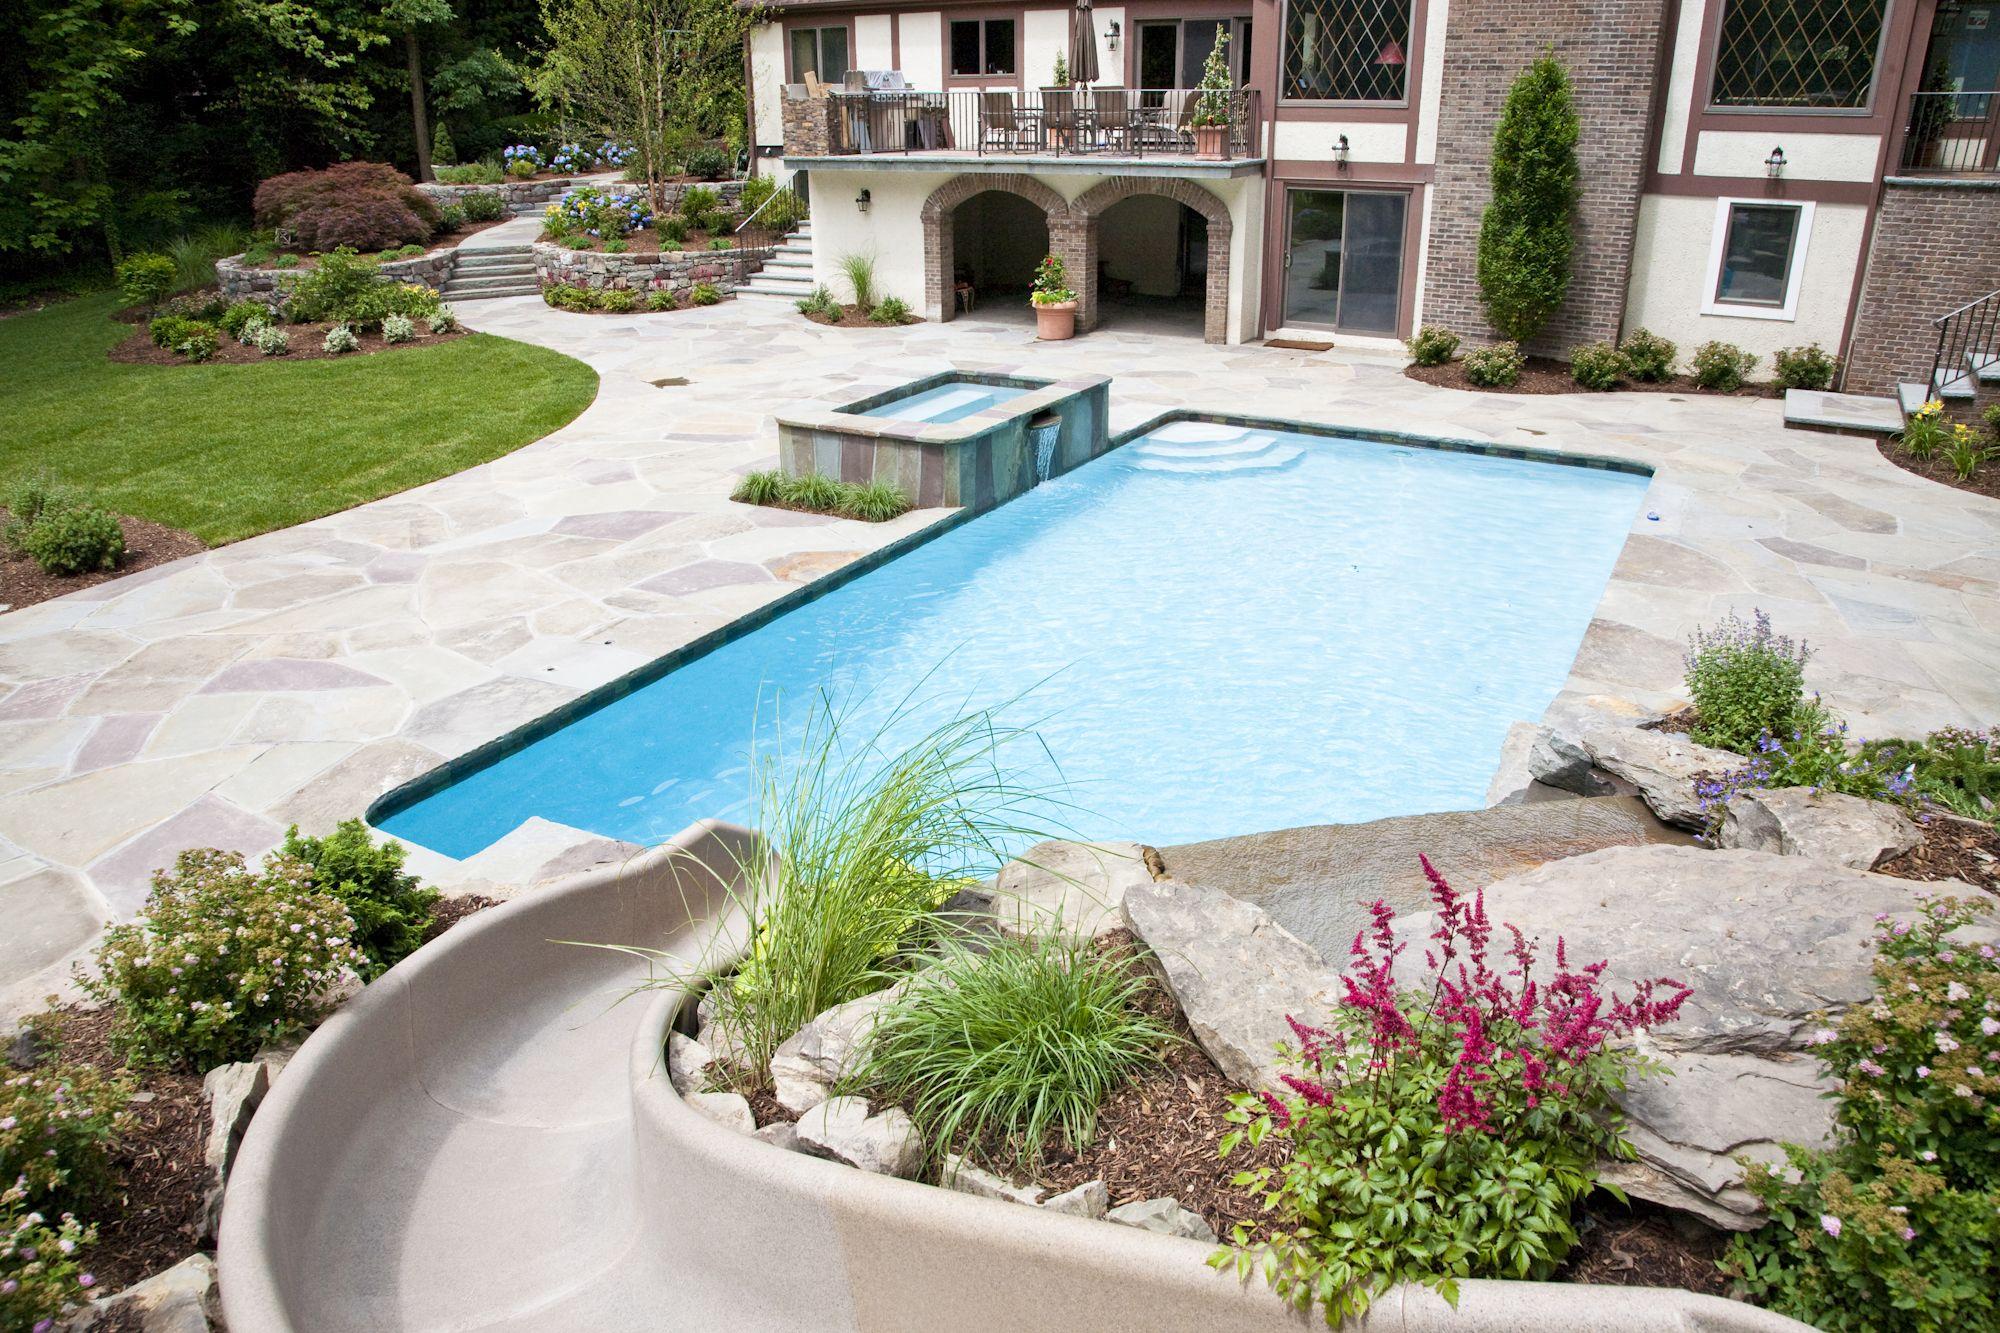 Backyard oasis | Backyard ideas | Pinterest on Designing A Backyard Oasis id=48480